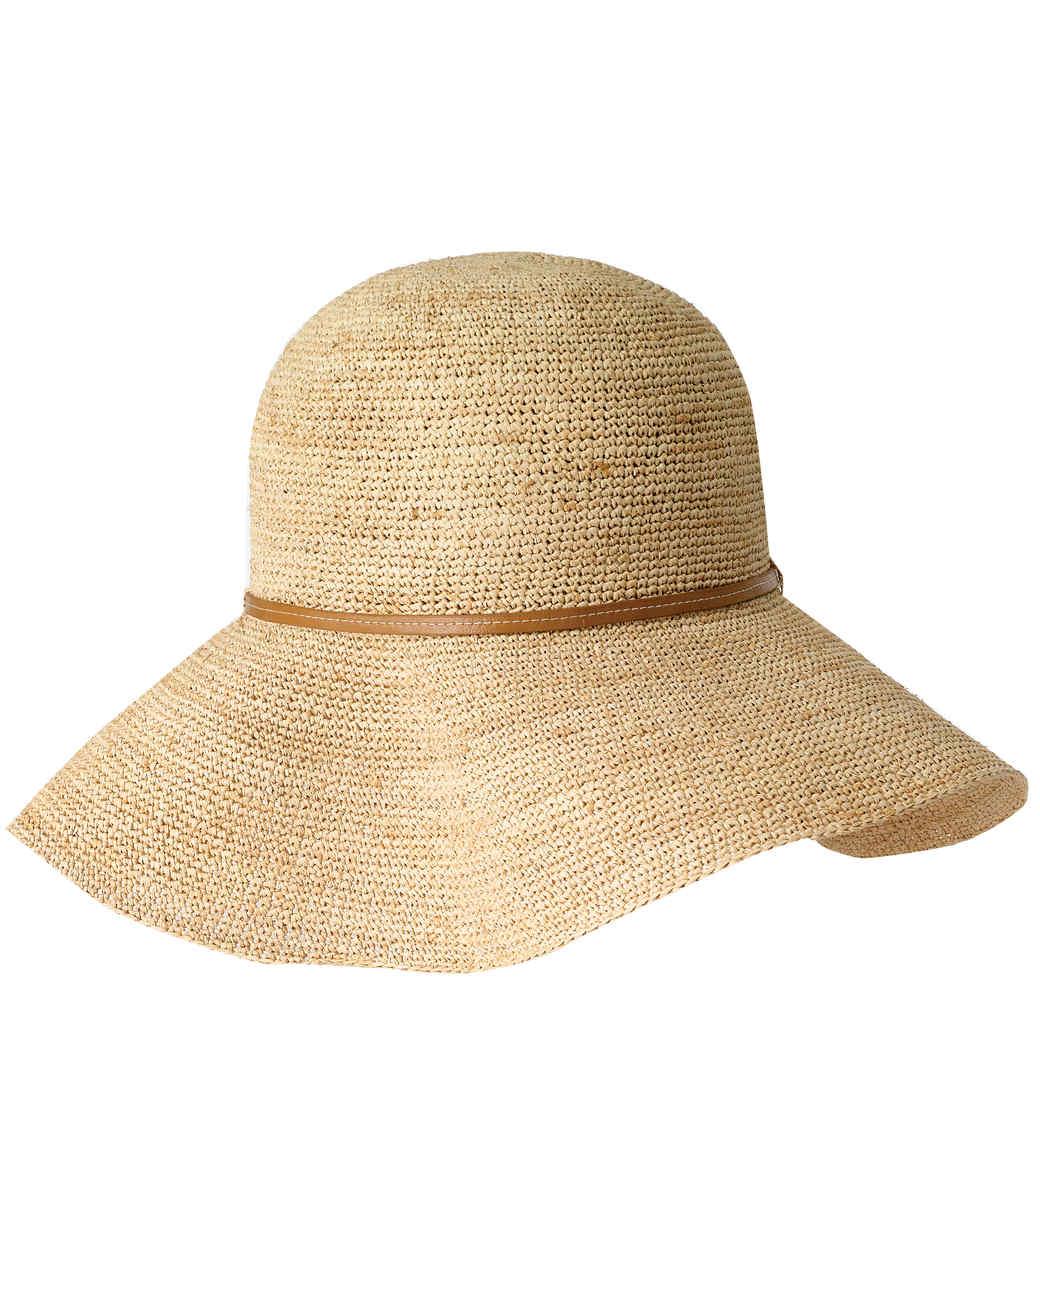 hat-finds-0811mld107422.jpg